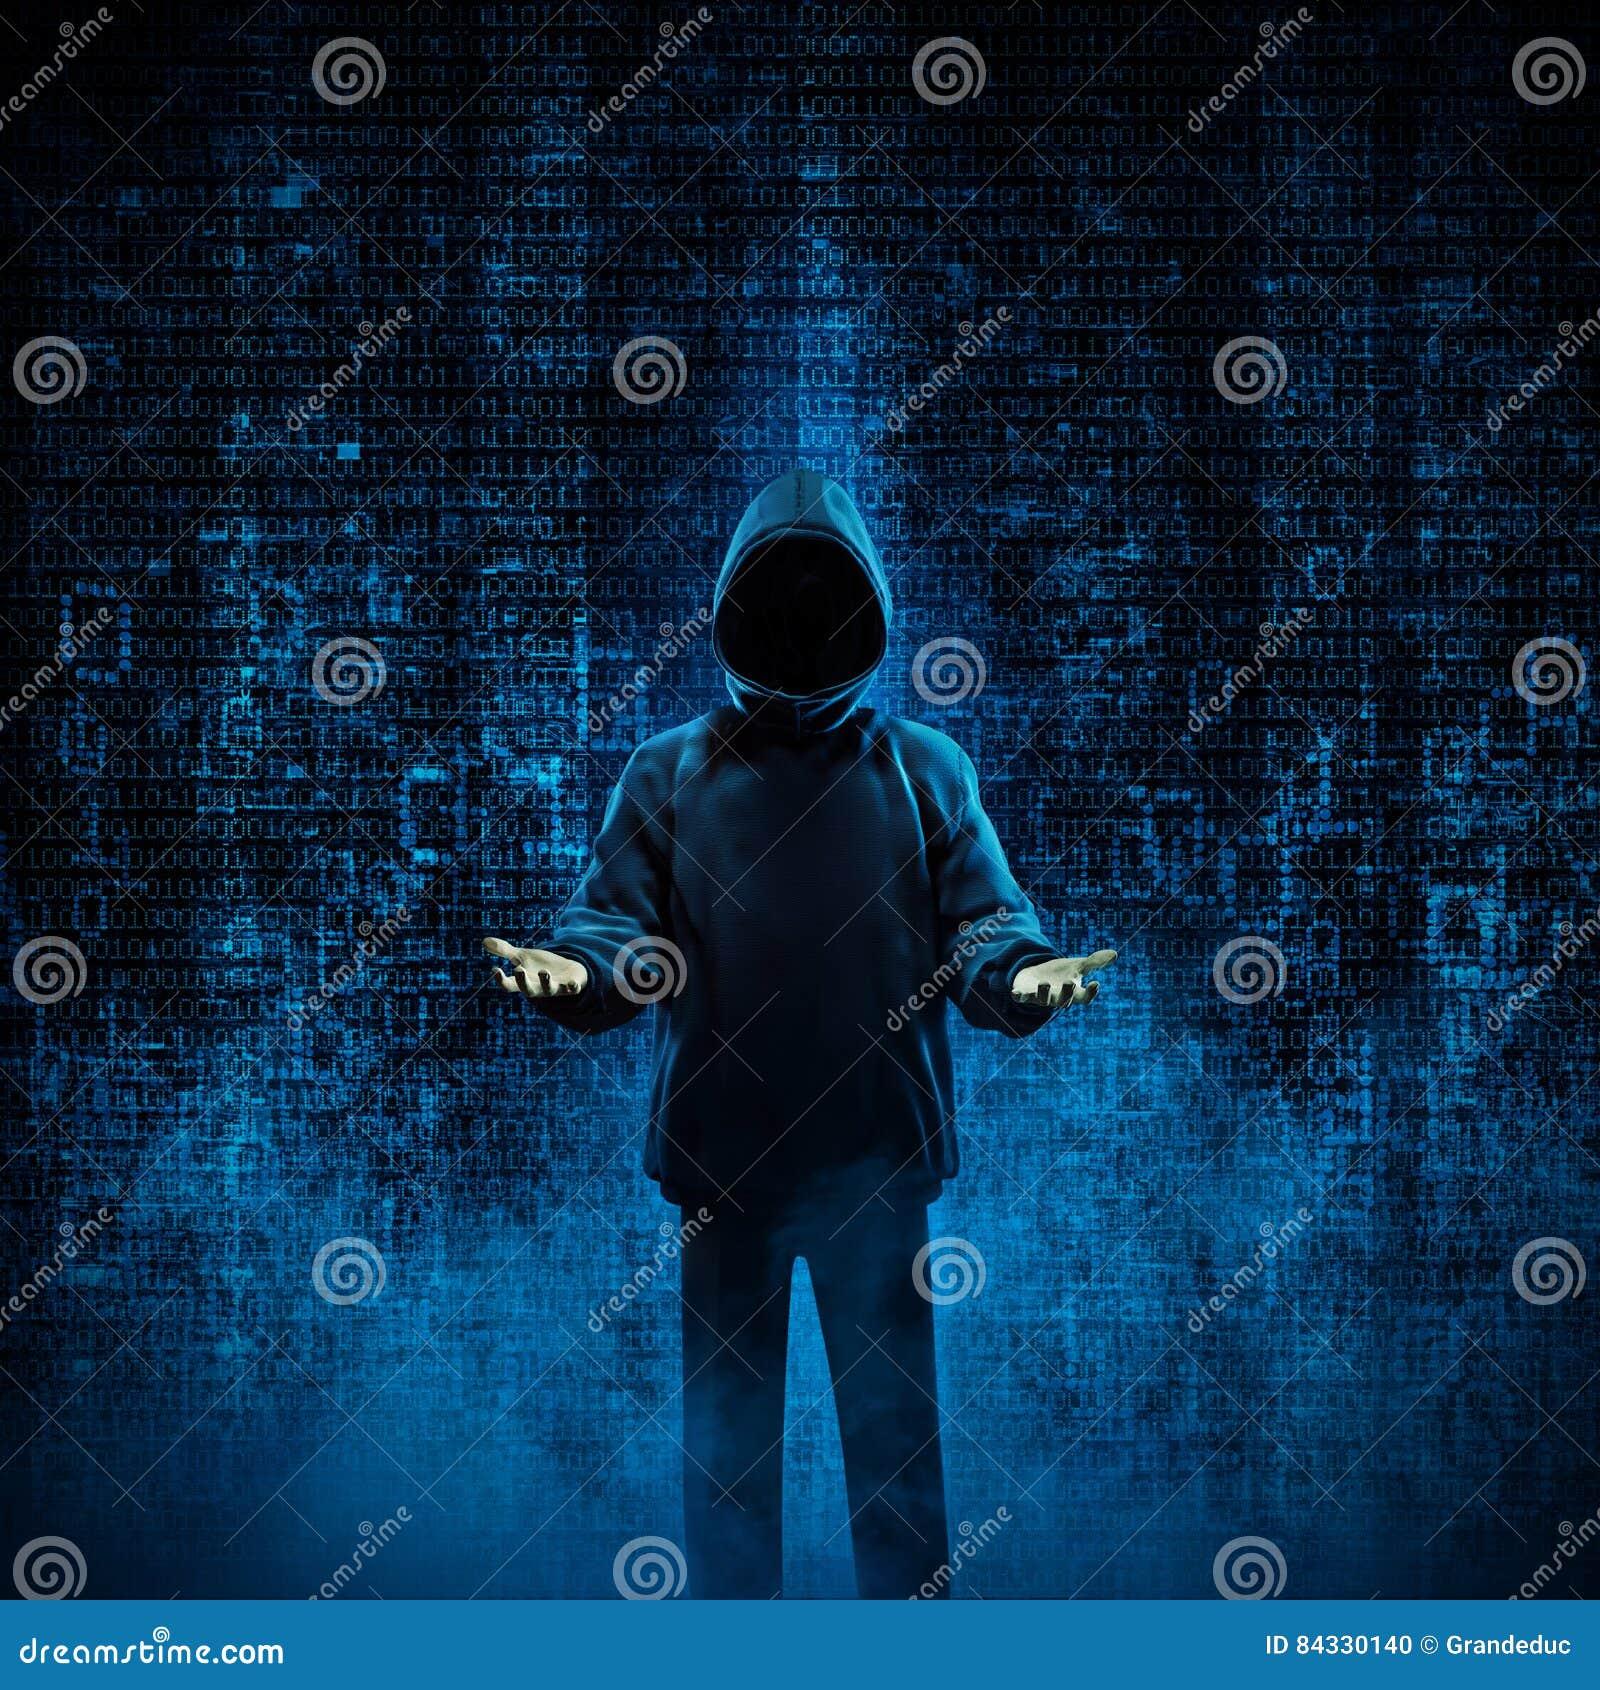 Hacker For Hire Illustration 84330140 - Megapixl